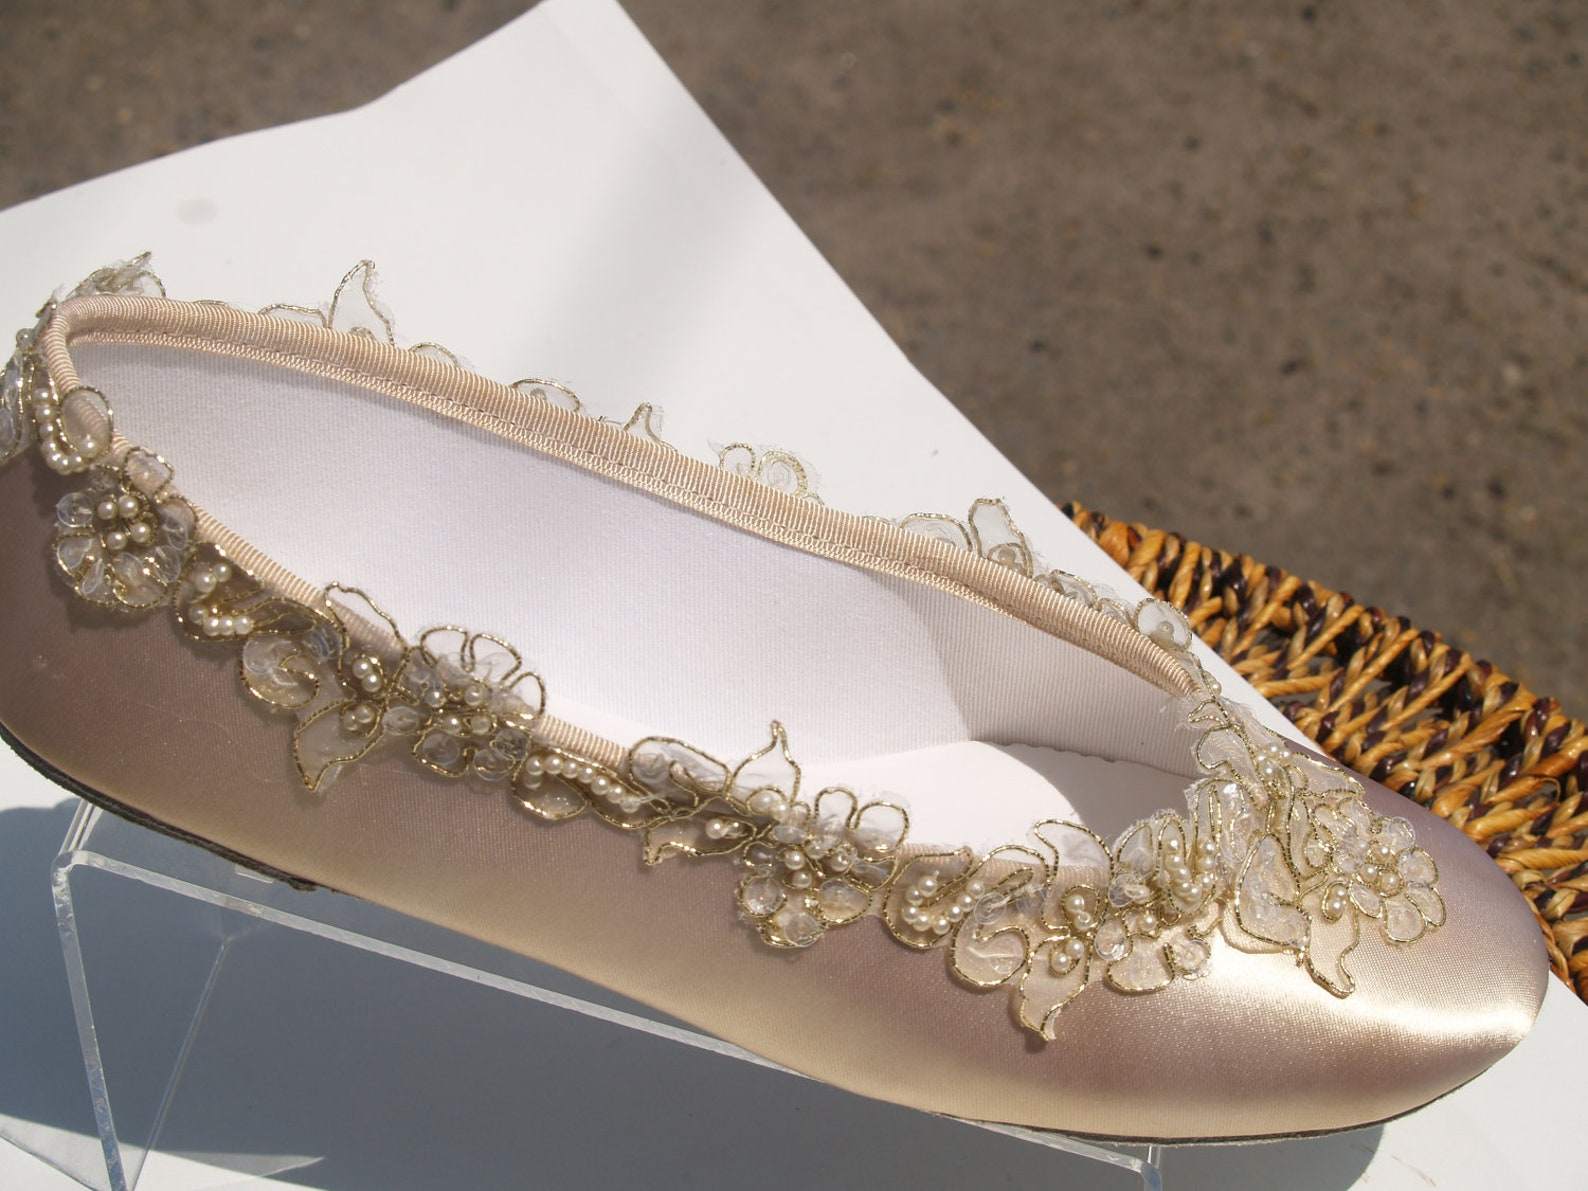 size 9 & 10 champagne wedding flats bridal shoe elegant gold trimmed,bridal flat shoes,satin ballet style slipper,romantic,ready